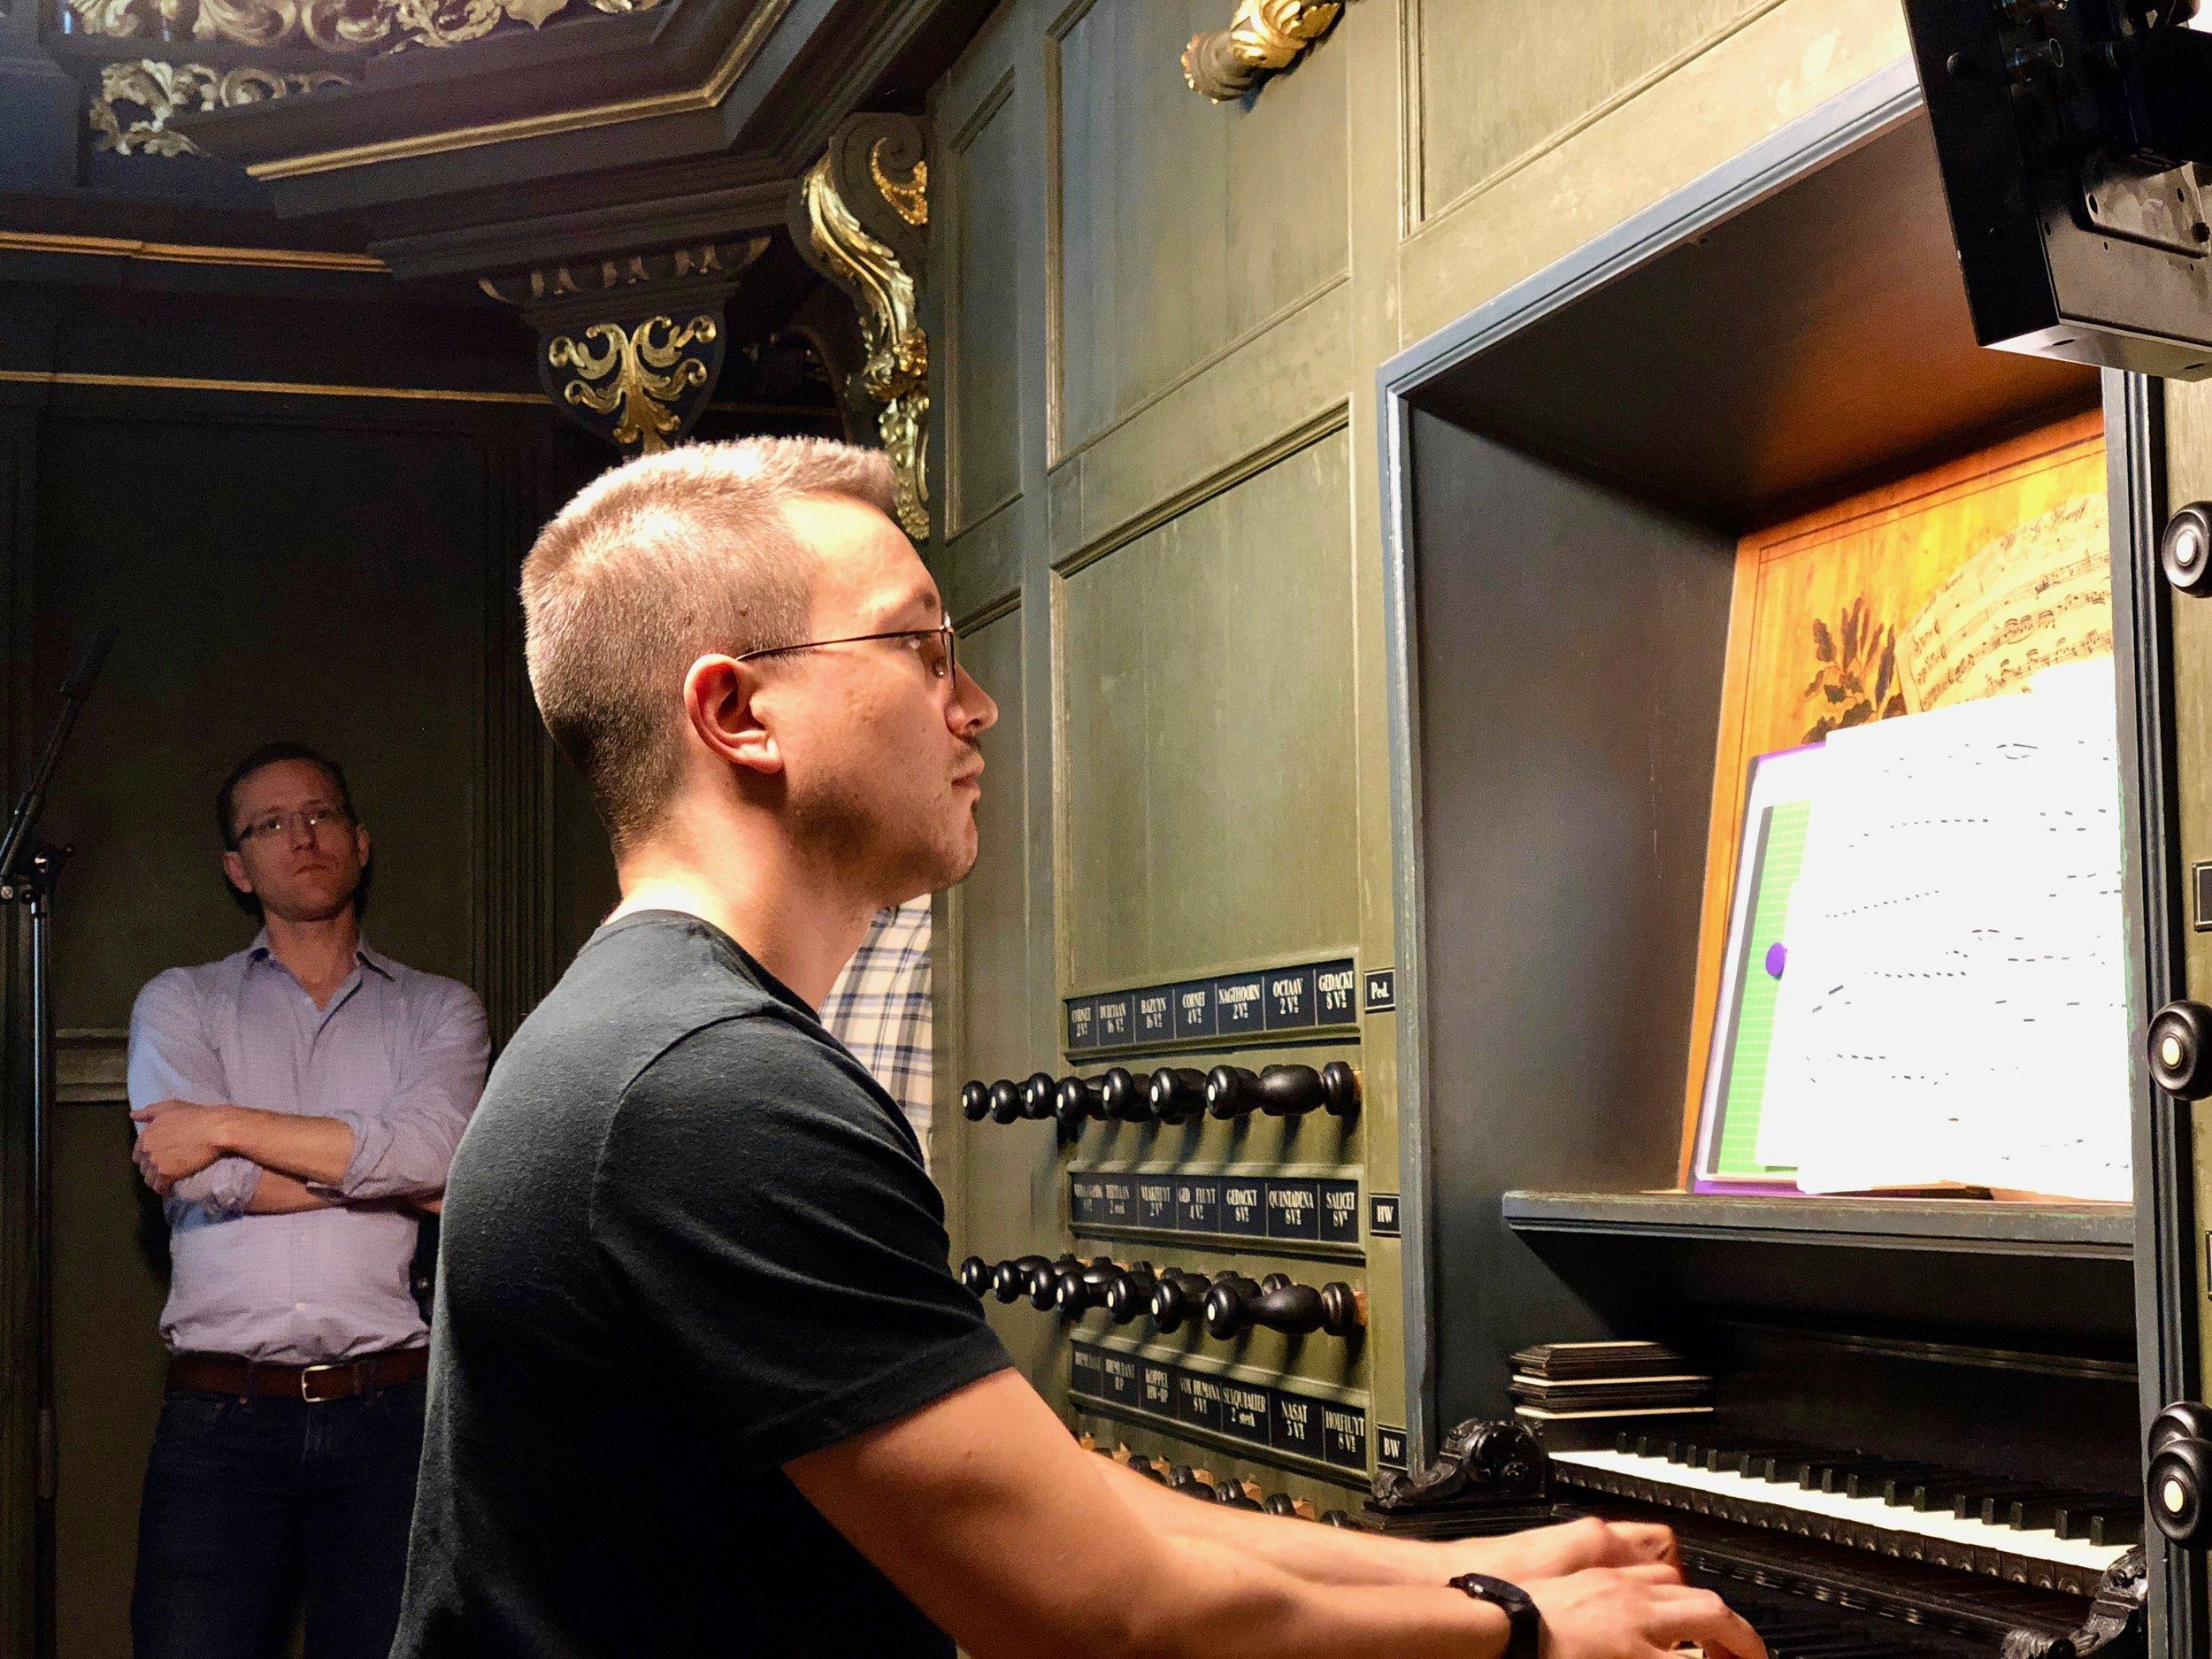 Corey De Tar at the console of 1692 Arp Schnitger pipe organ, Martinikerk, Groningen.